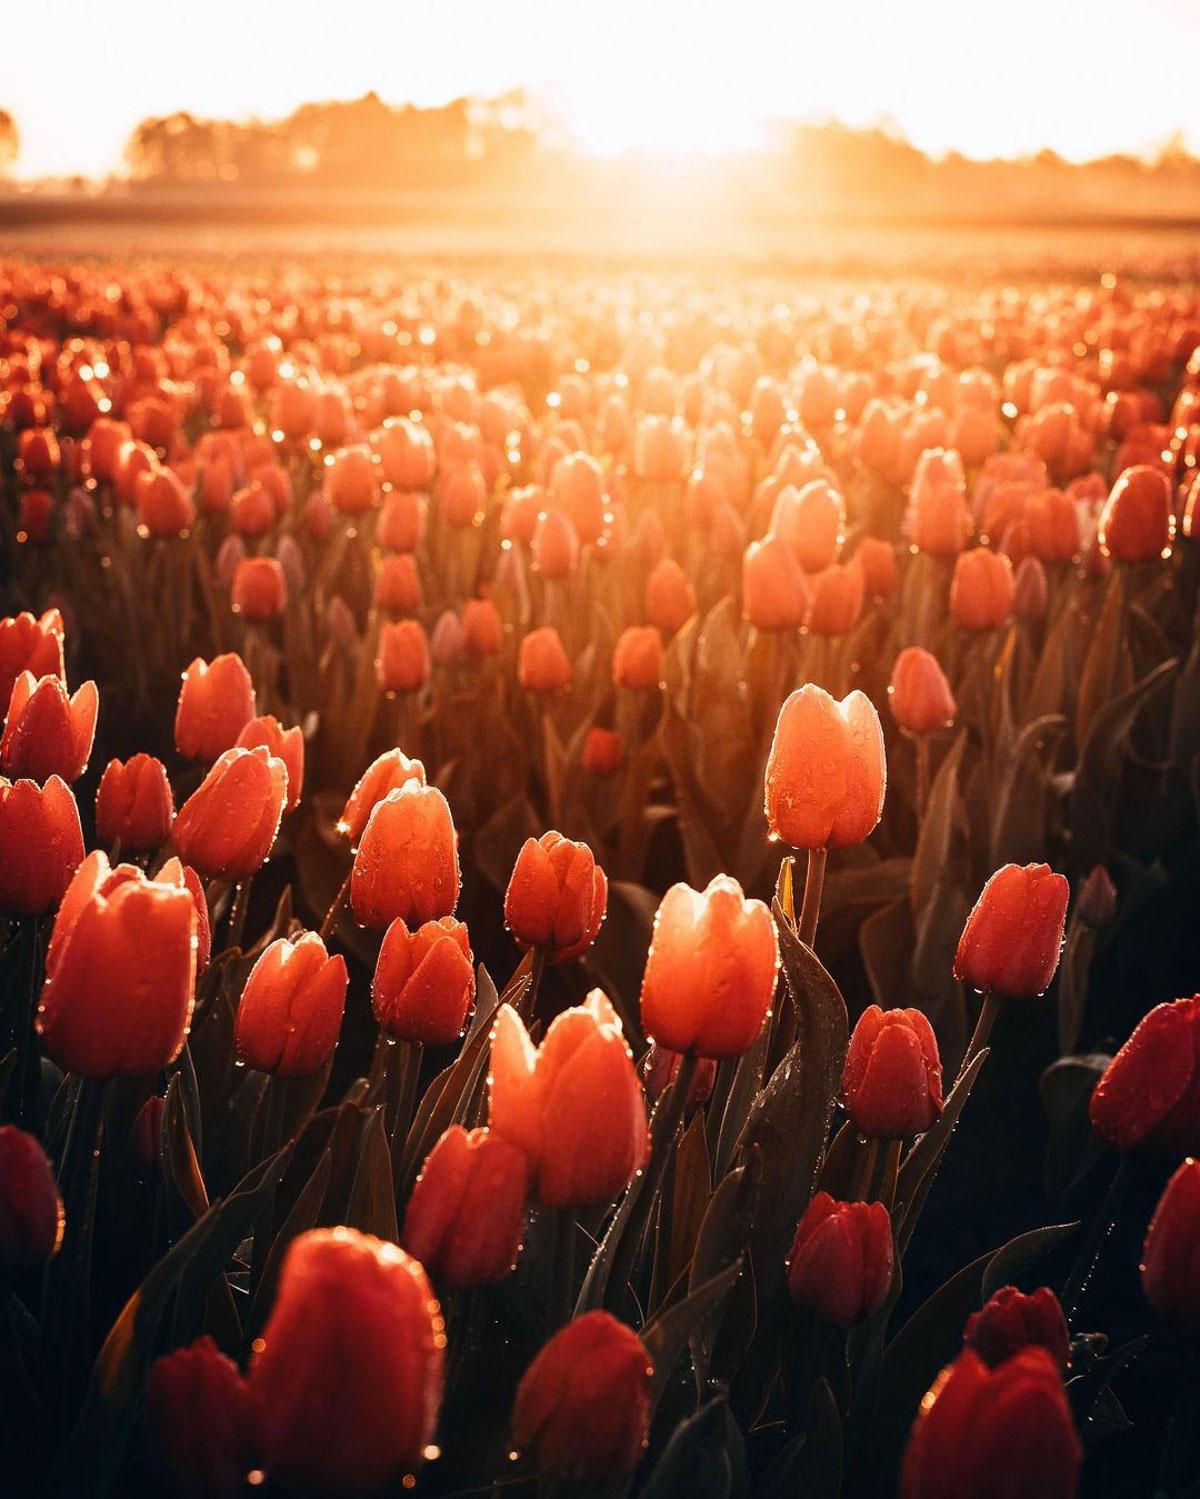 Tulip fields Groningen Smilde by photographer Marion Stoffels